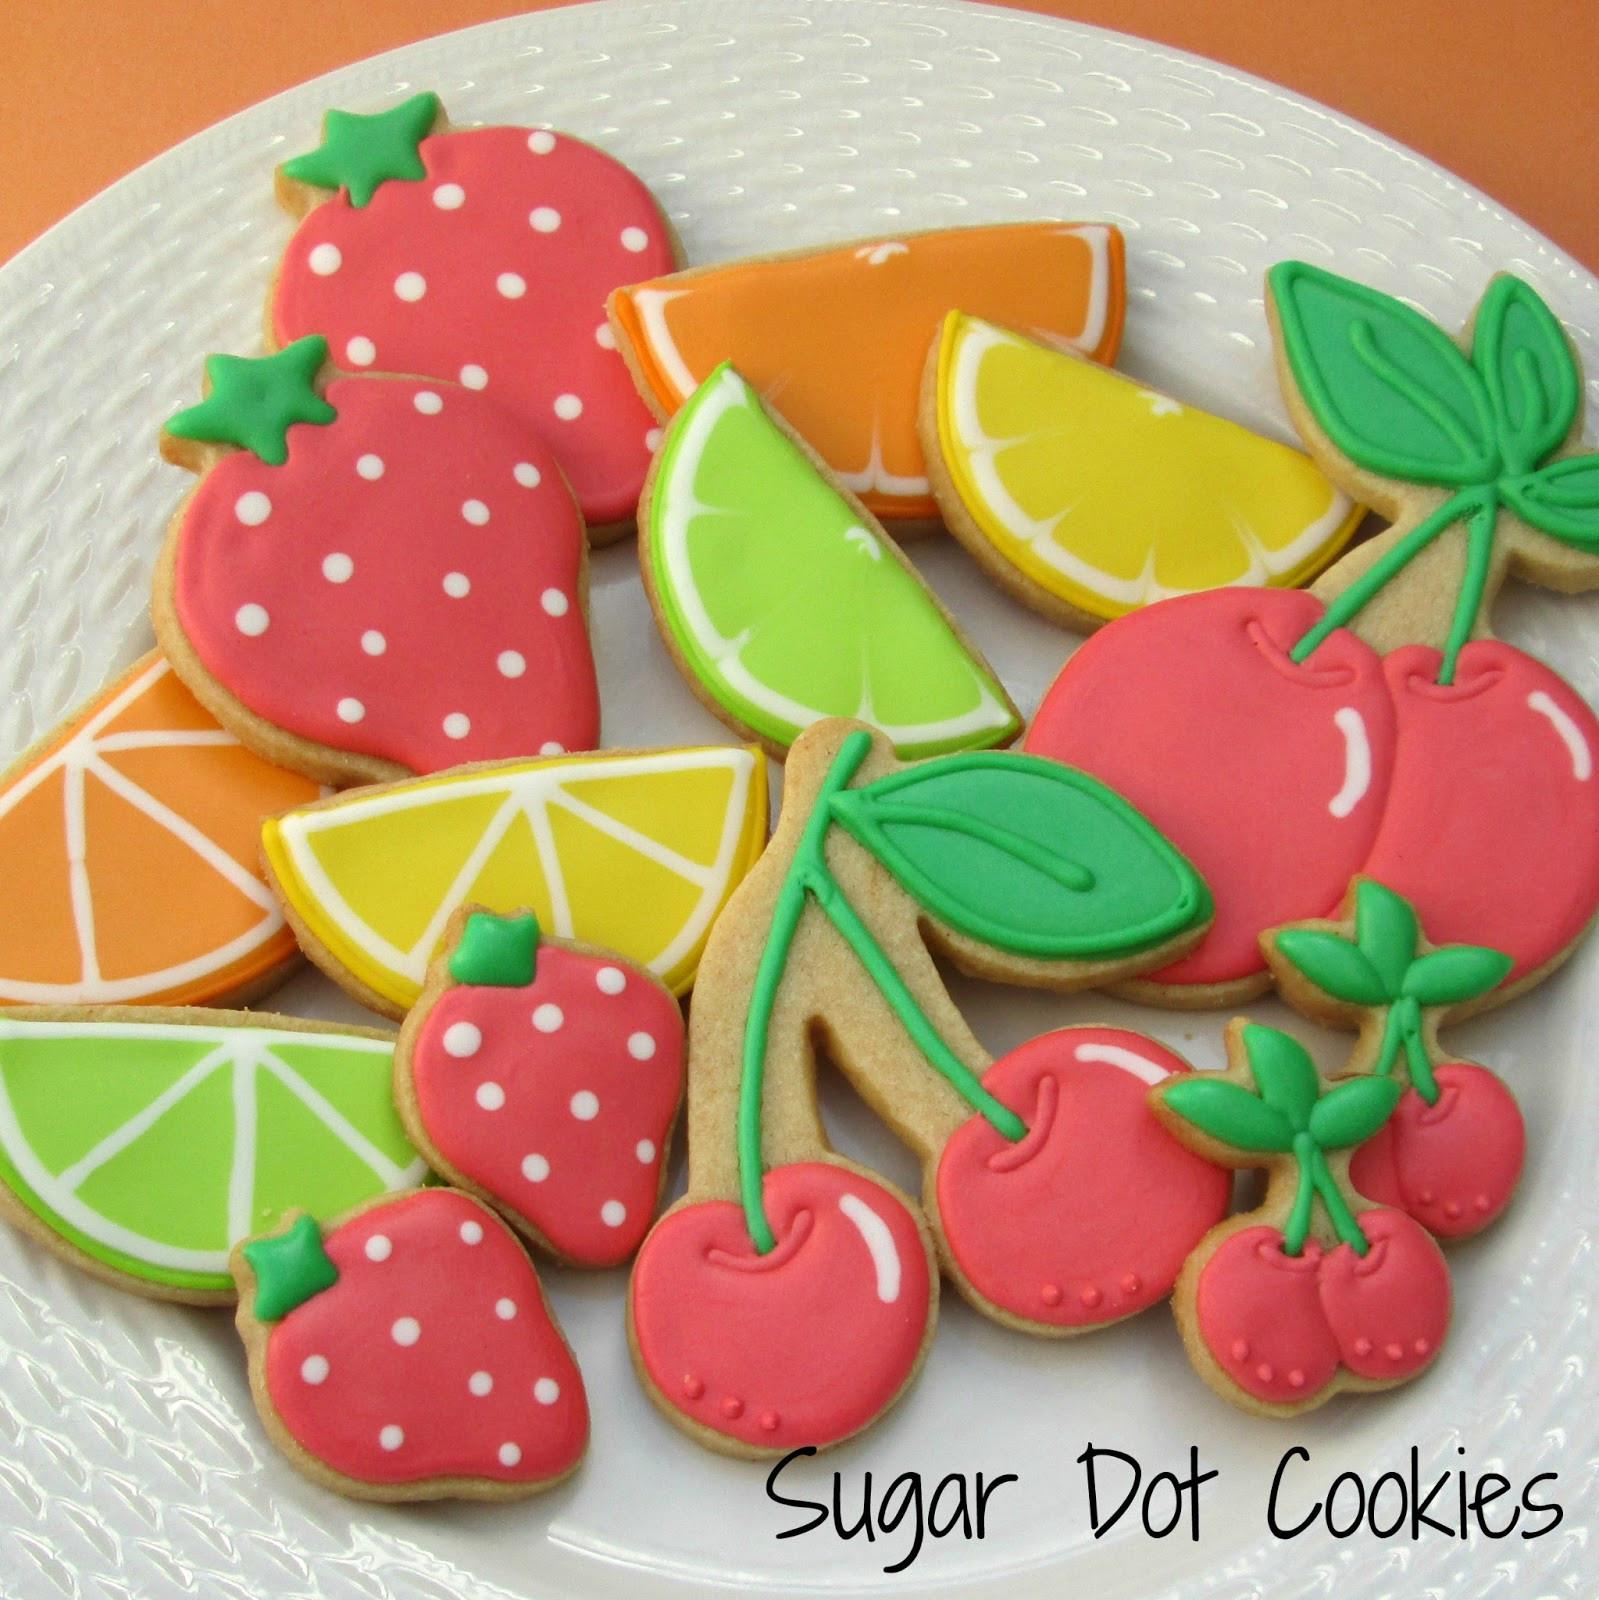 Summer Sugar Cookies  Friday April 19 2013